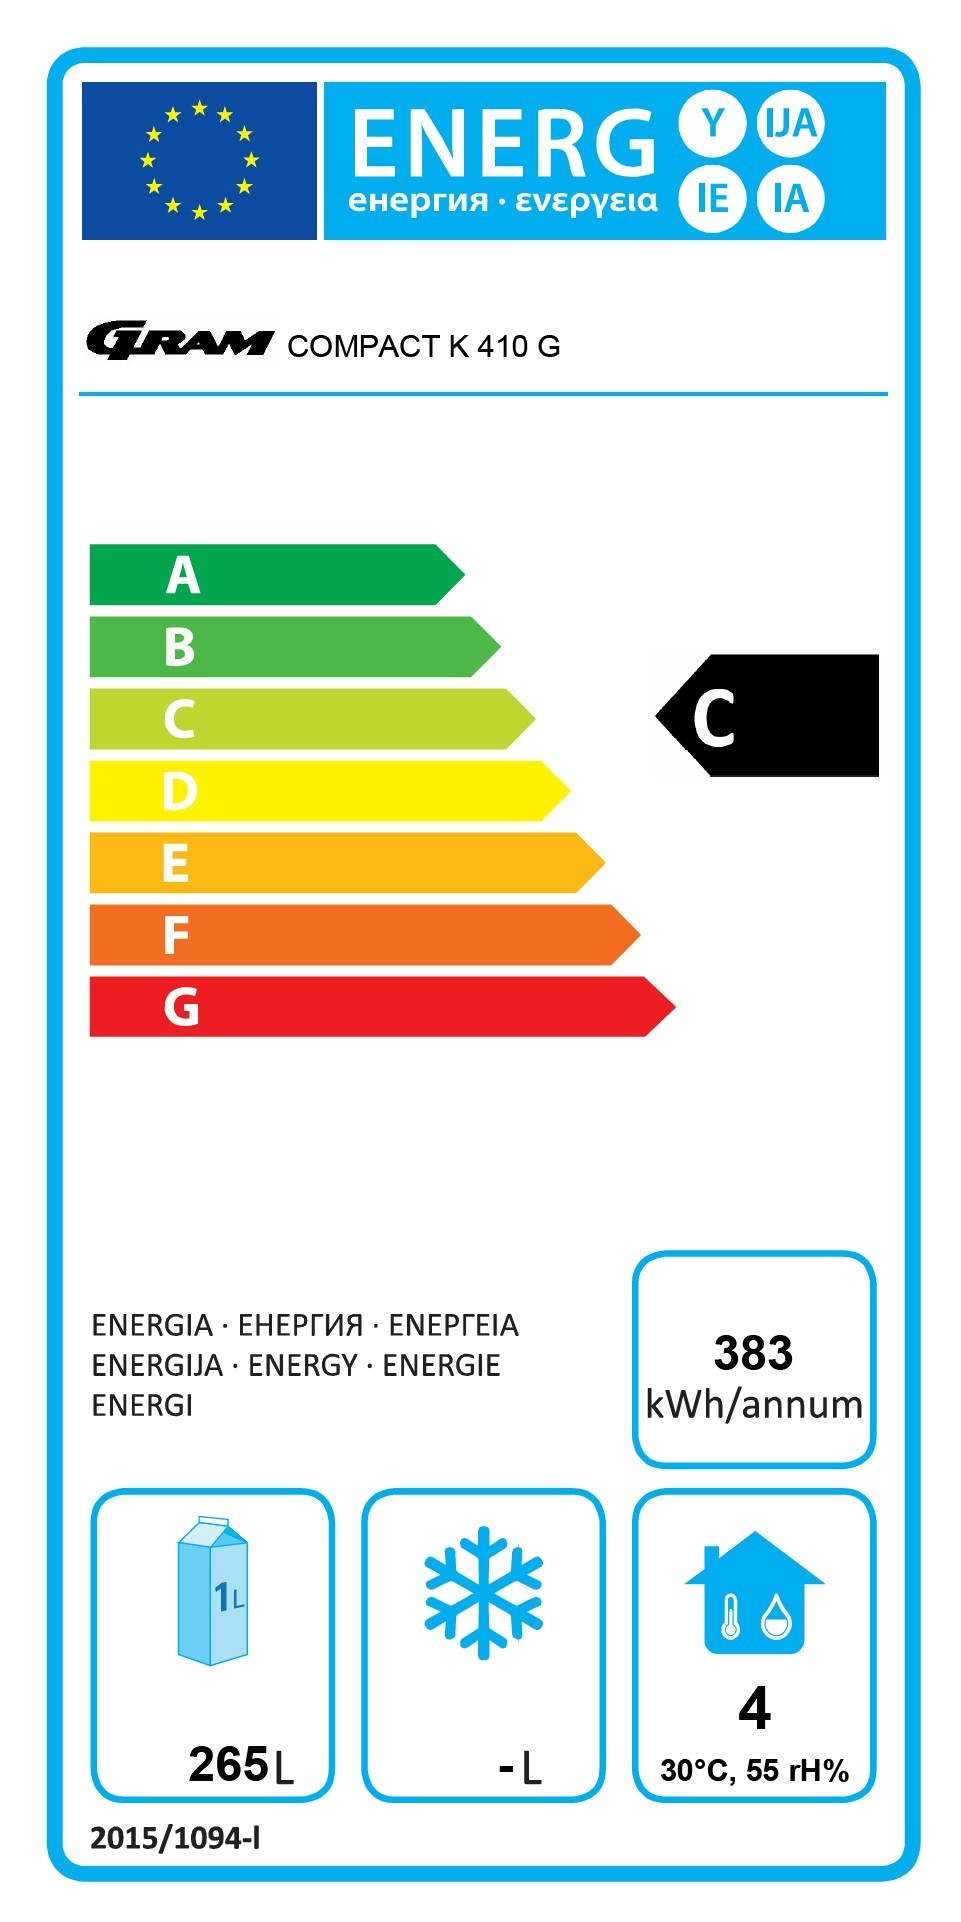 COMPACT K 410 LG C 6W 346 Ltr Upright Fridge Energy Rating